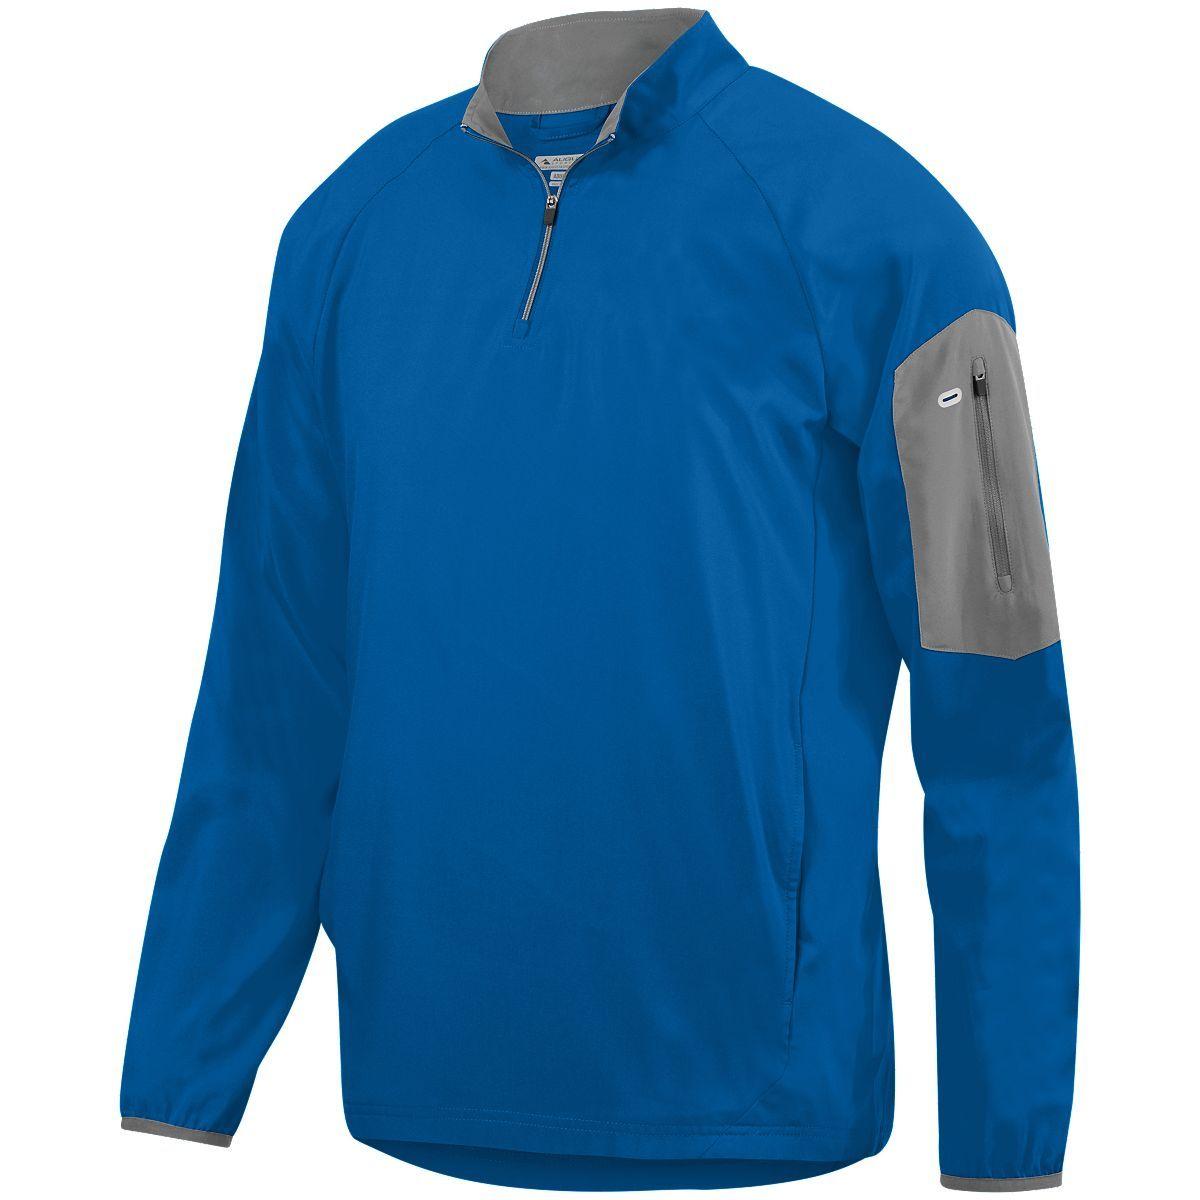 Preeminent Half-Zip Pullover - ROYAL/GRAPHITE